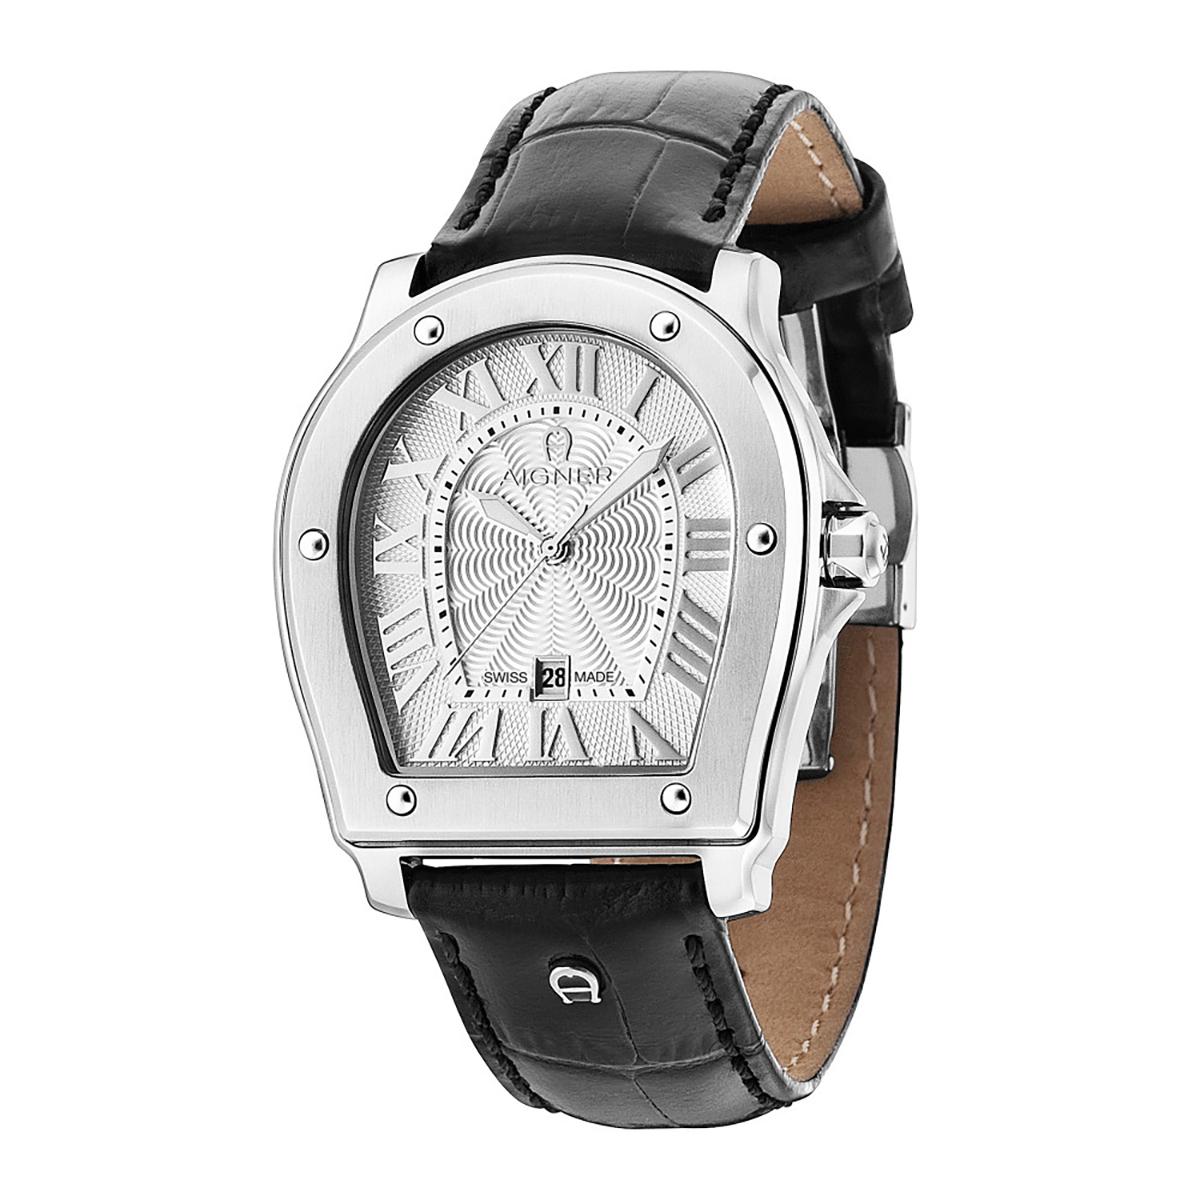 ساعت مچی عقربه ای مردانه اگنر مدل A105105 25